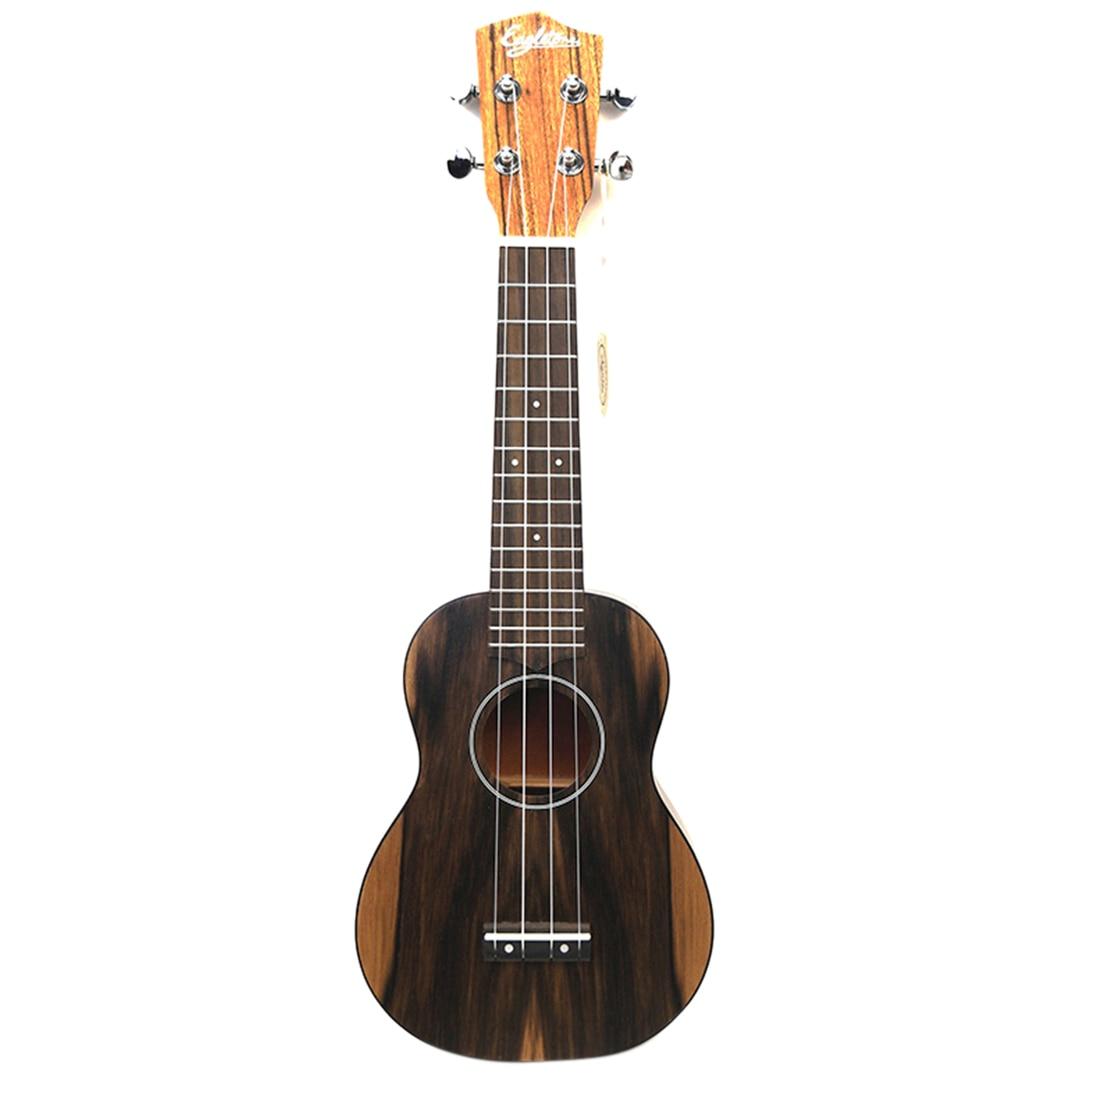 21 polegadas iniciante nogueira ukulele 4 cordas kit de guitarra-burlywood